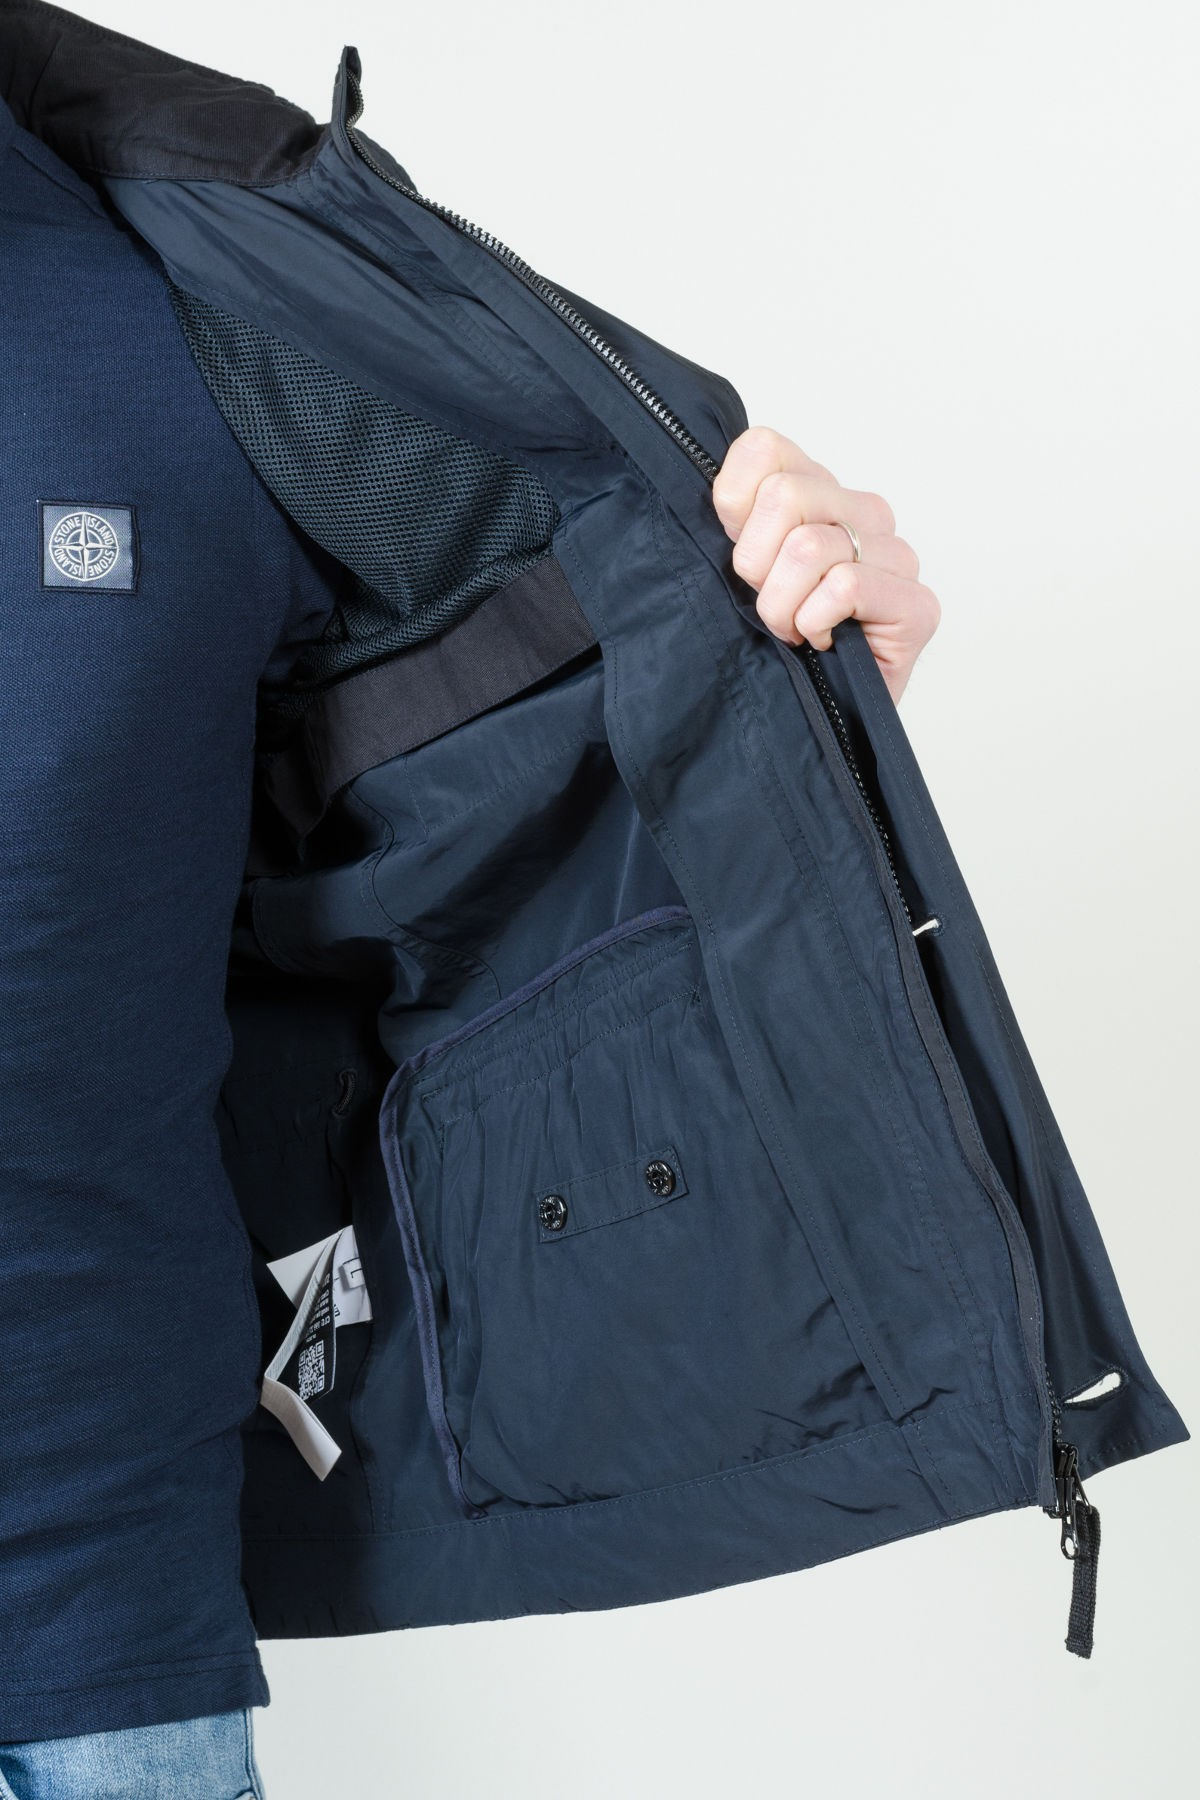 839c375adea Jacket for man STONE ISLAND S/S17 - Rione Fontana